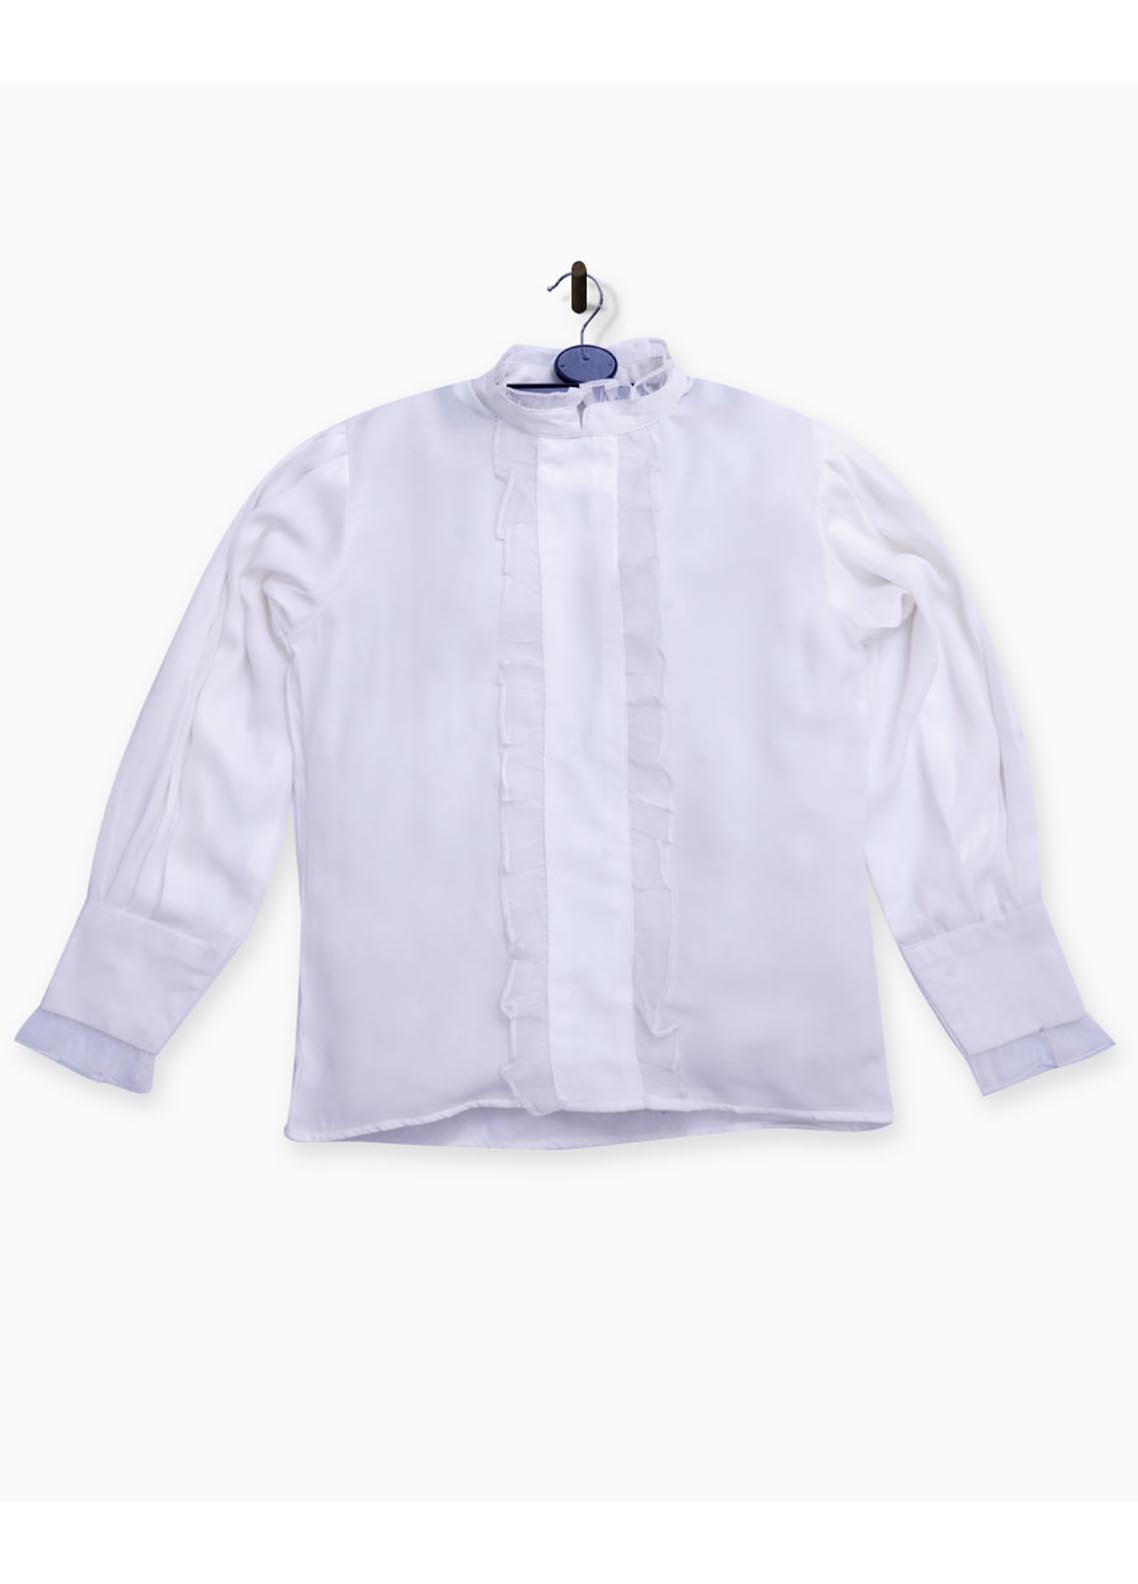 Kids Polo Crepe Fancy Girls Shirts -  GWWK20201